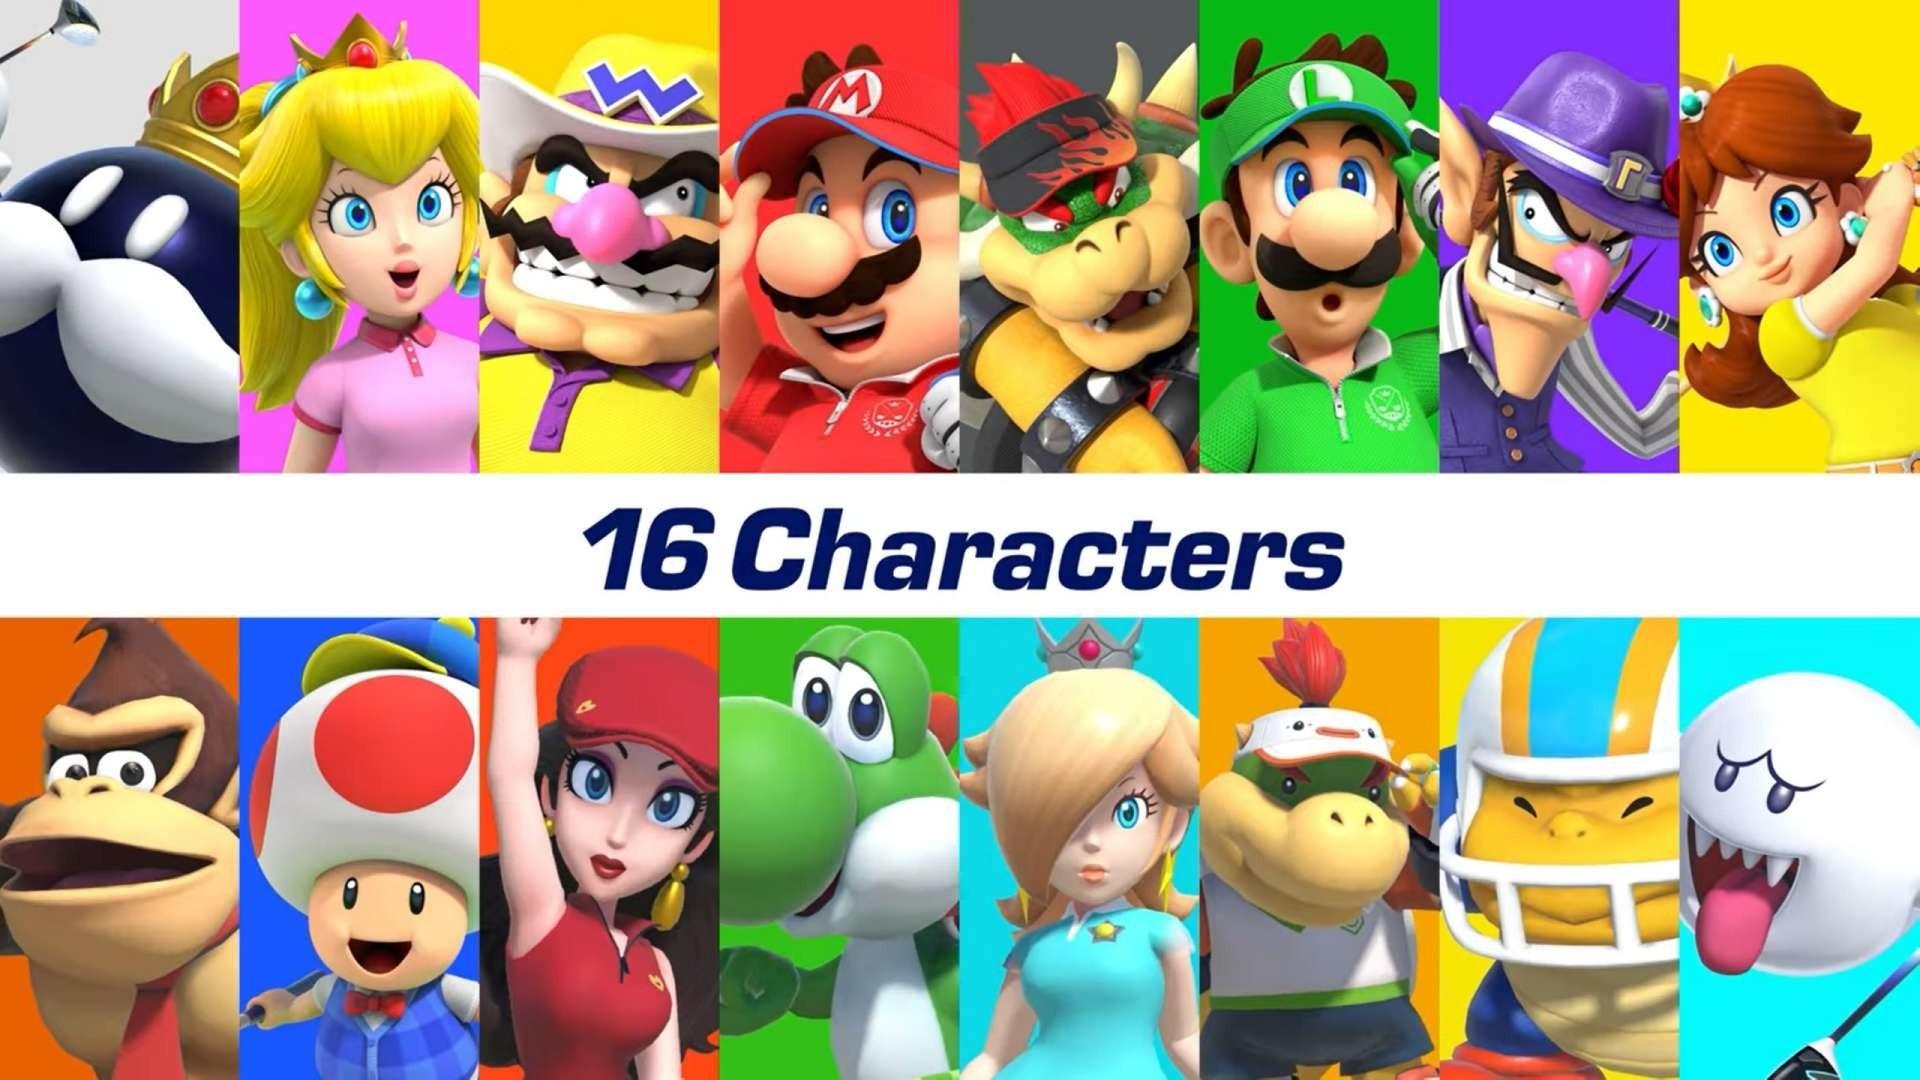 Mario Golf: Super Rush full roster confirmed